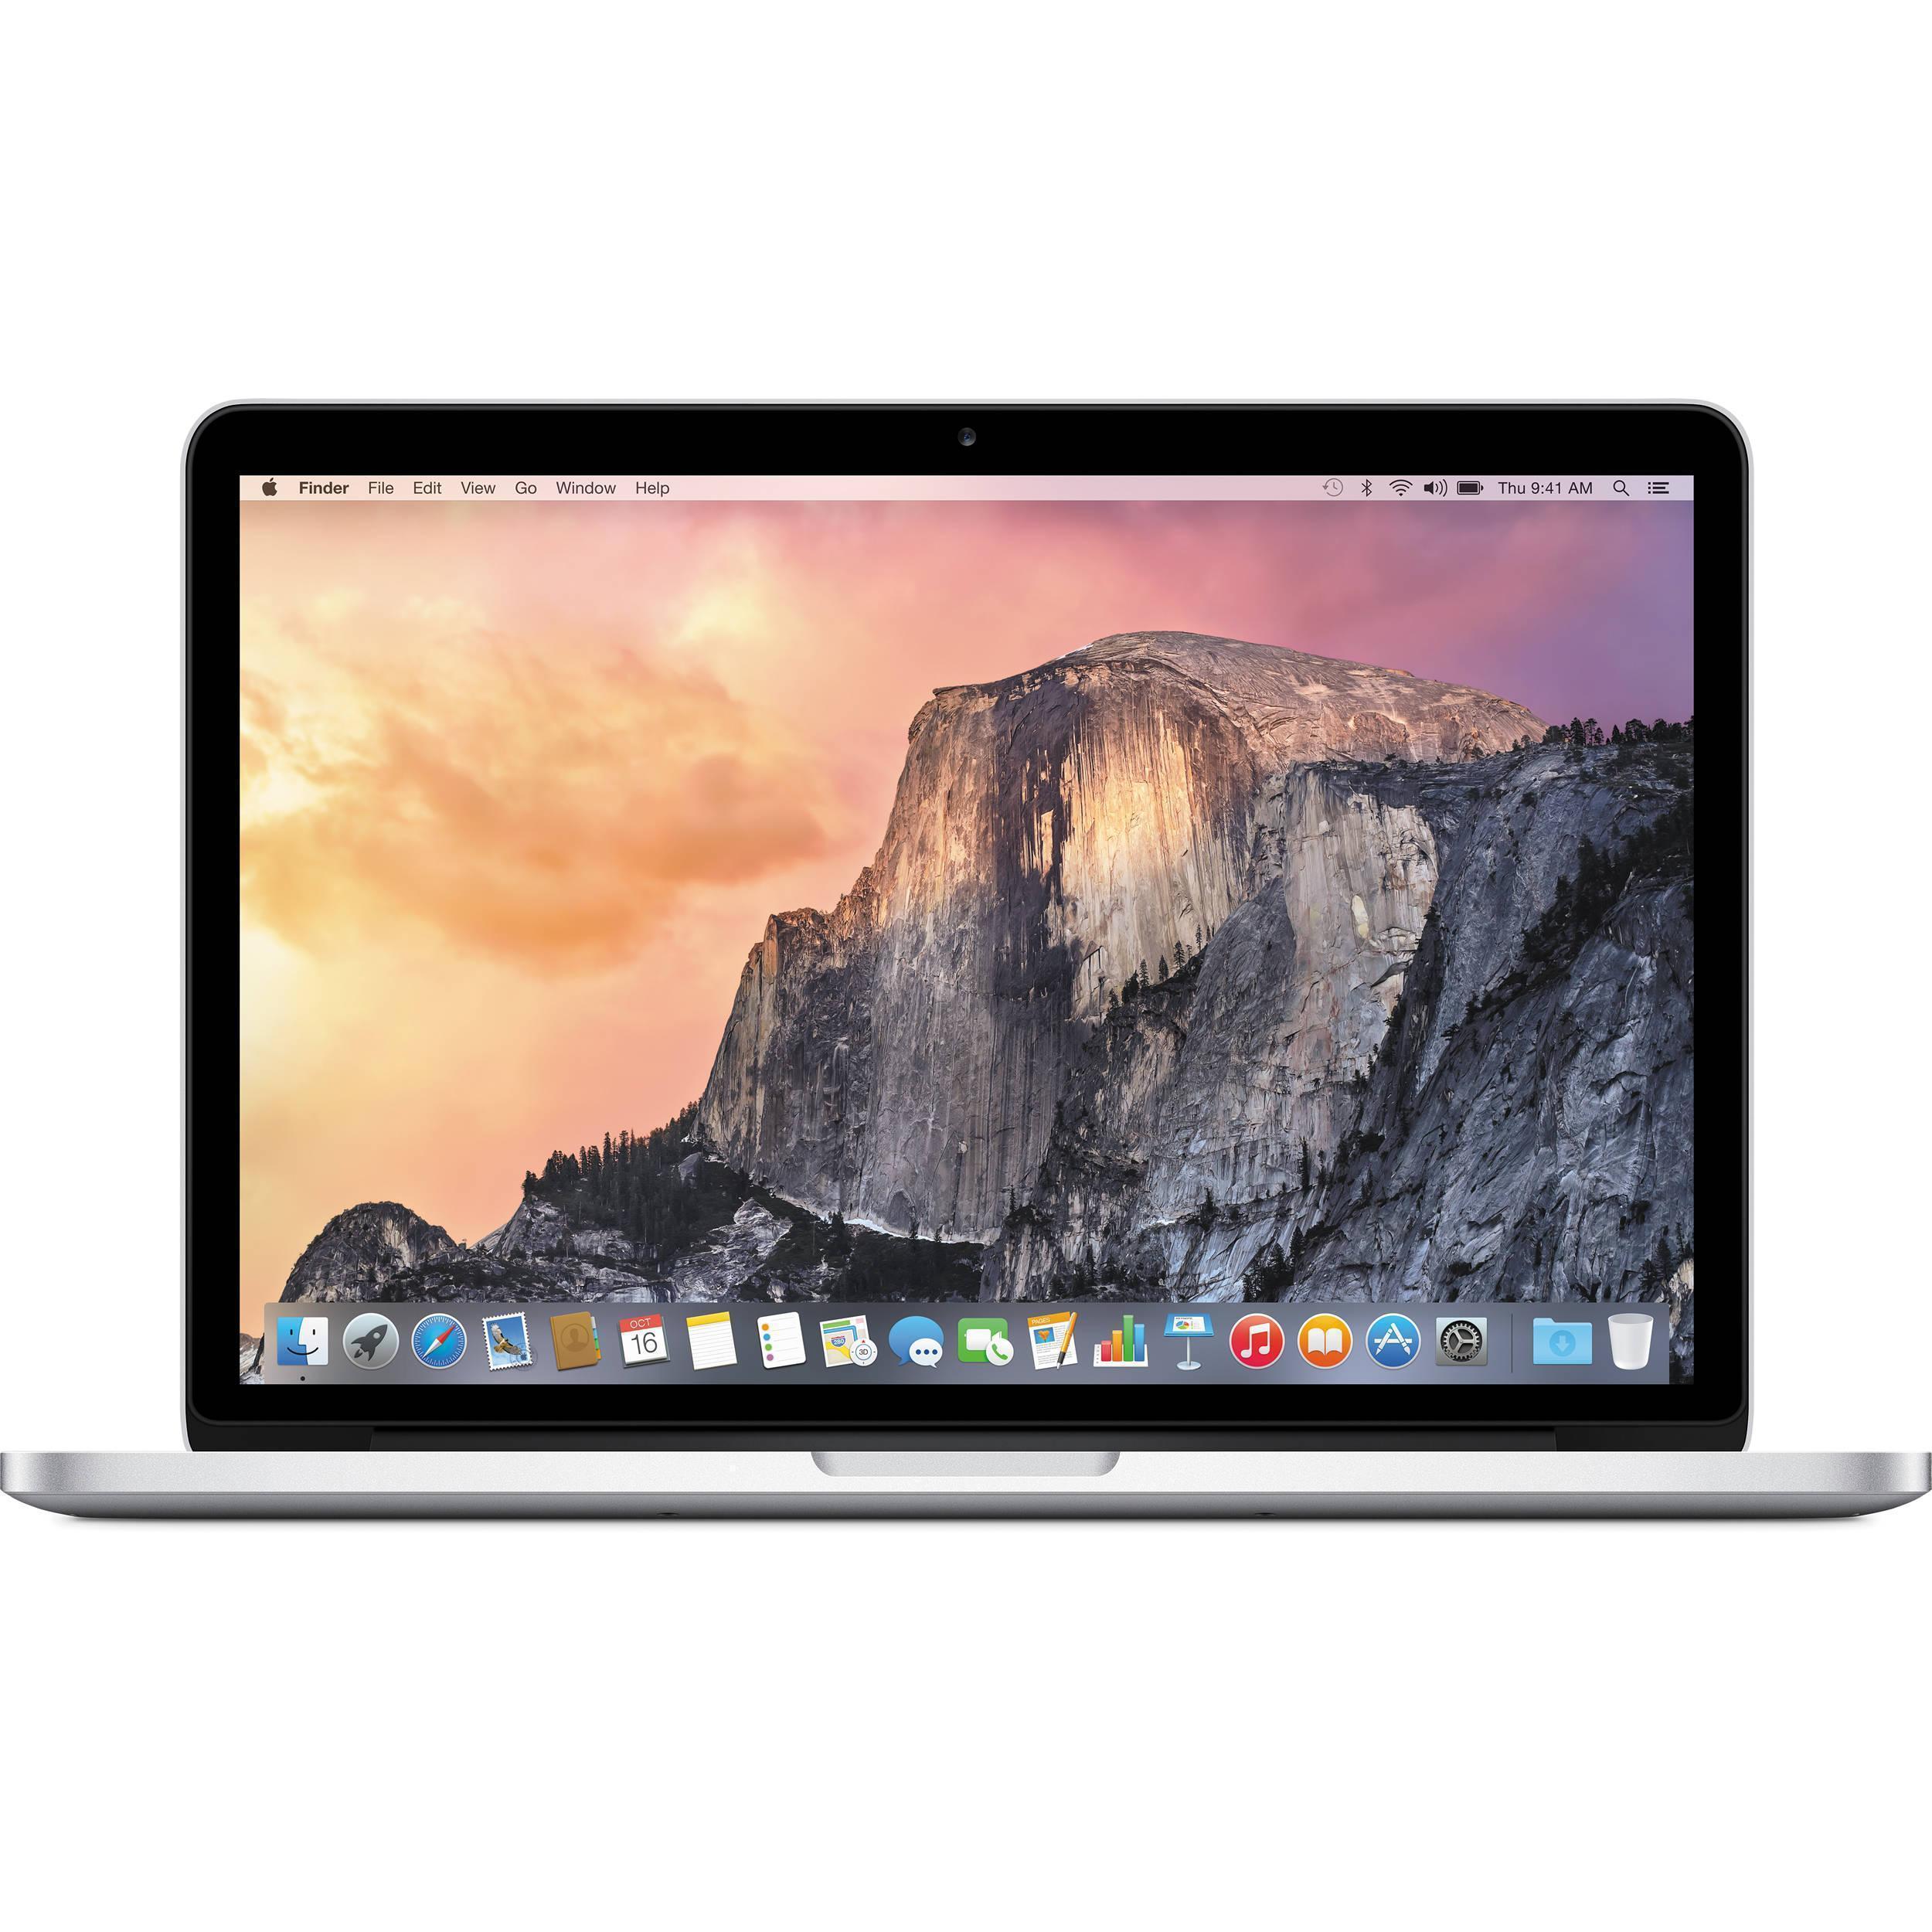 MacBook Pro Retina 13.3-inch (2013) - Core i5 - 8GB - SSD 256 GB